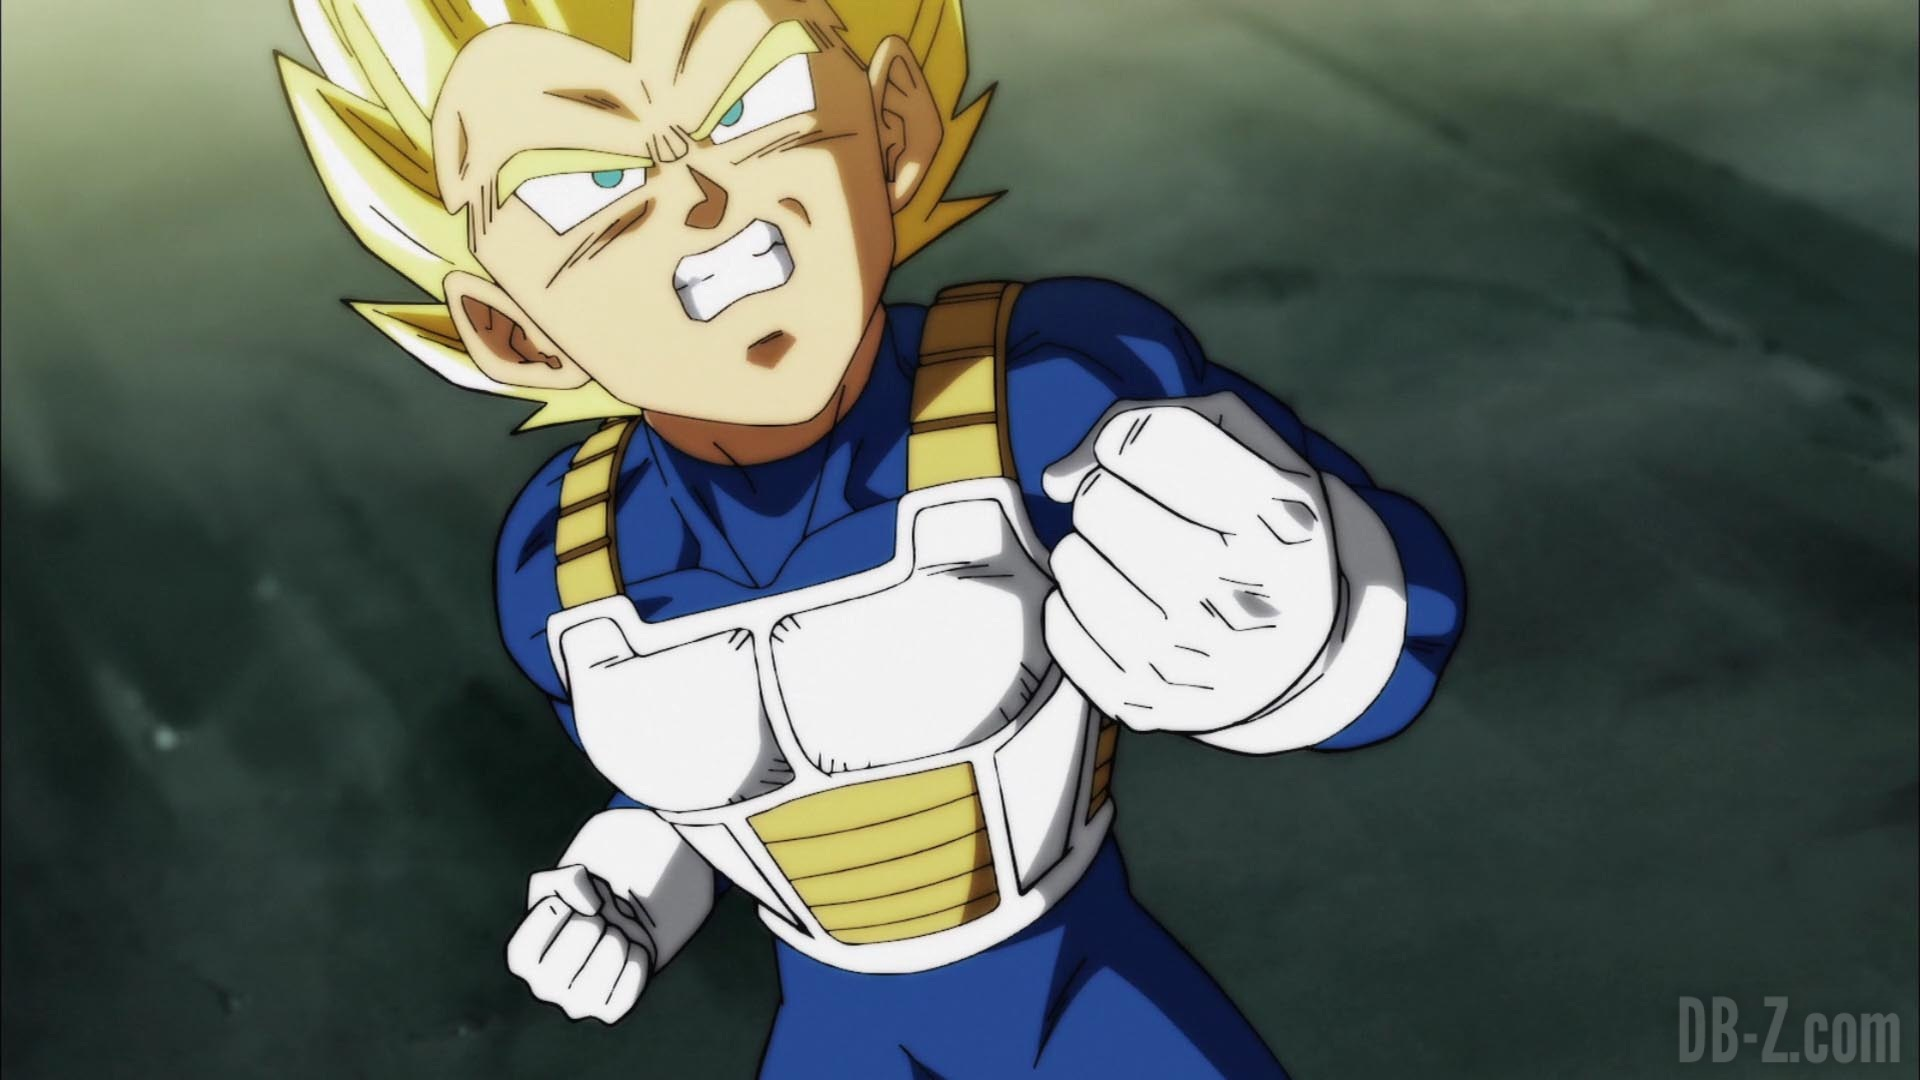 Dragon-Ball-Super-Episode-99-47-Vegeta.j